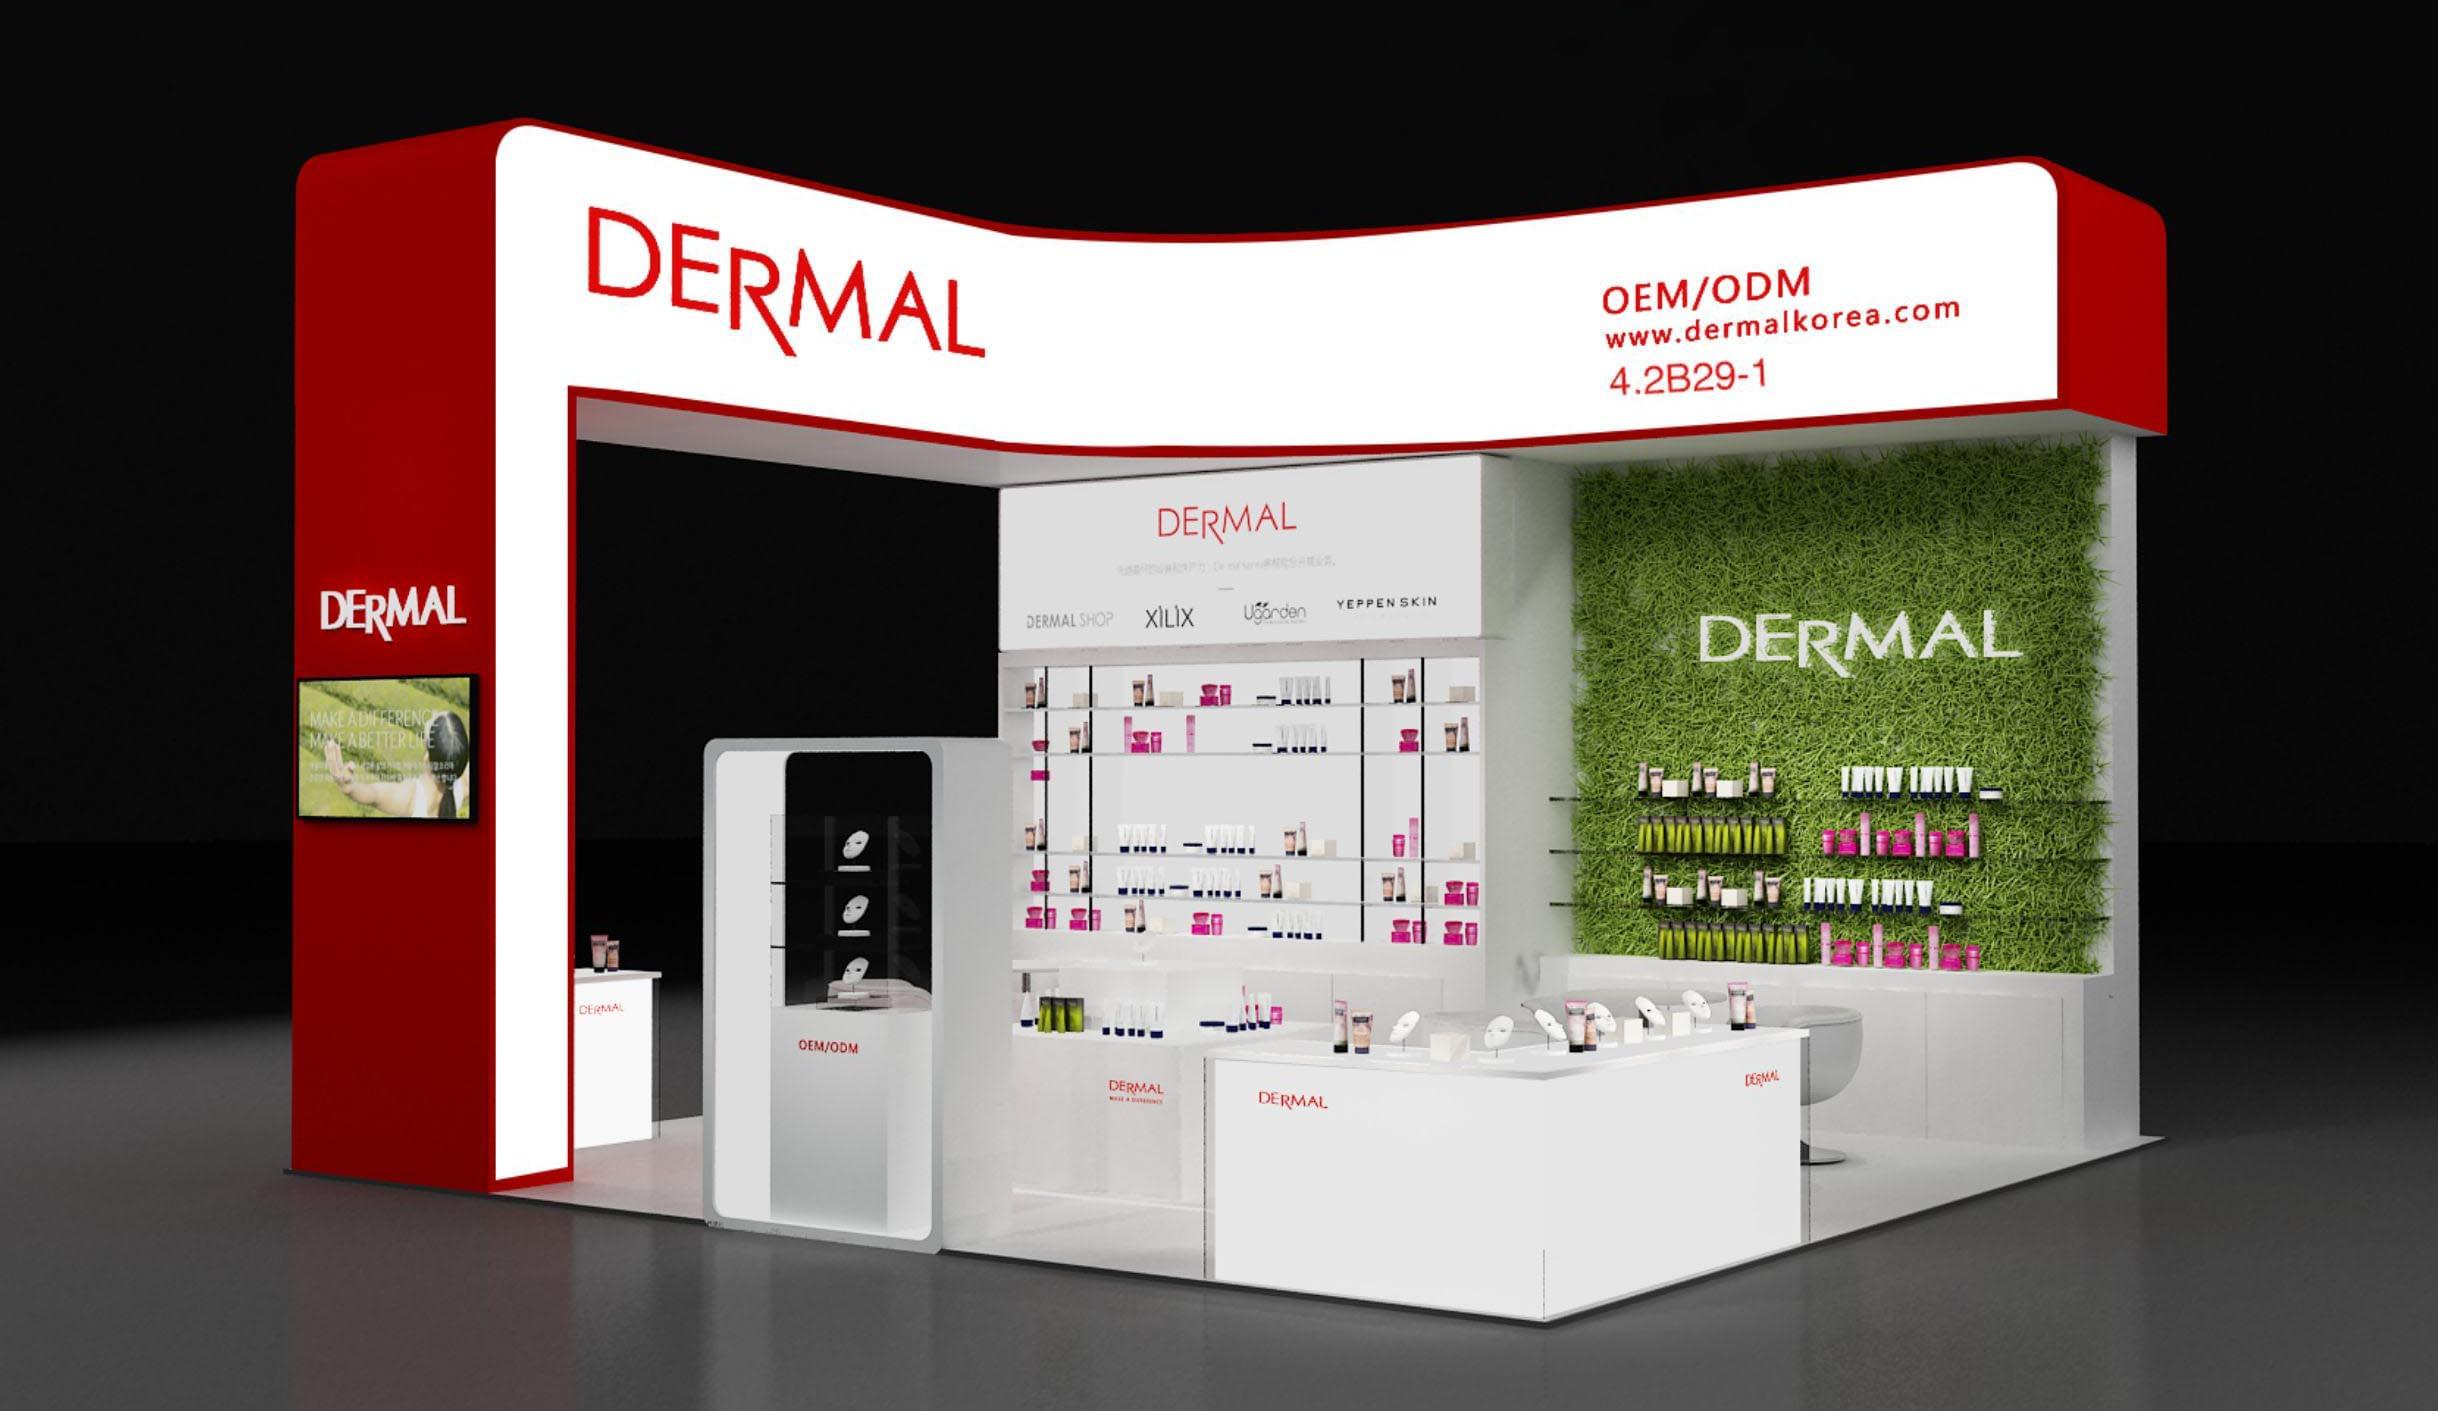 Dermal_美博会展台设计